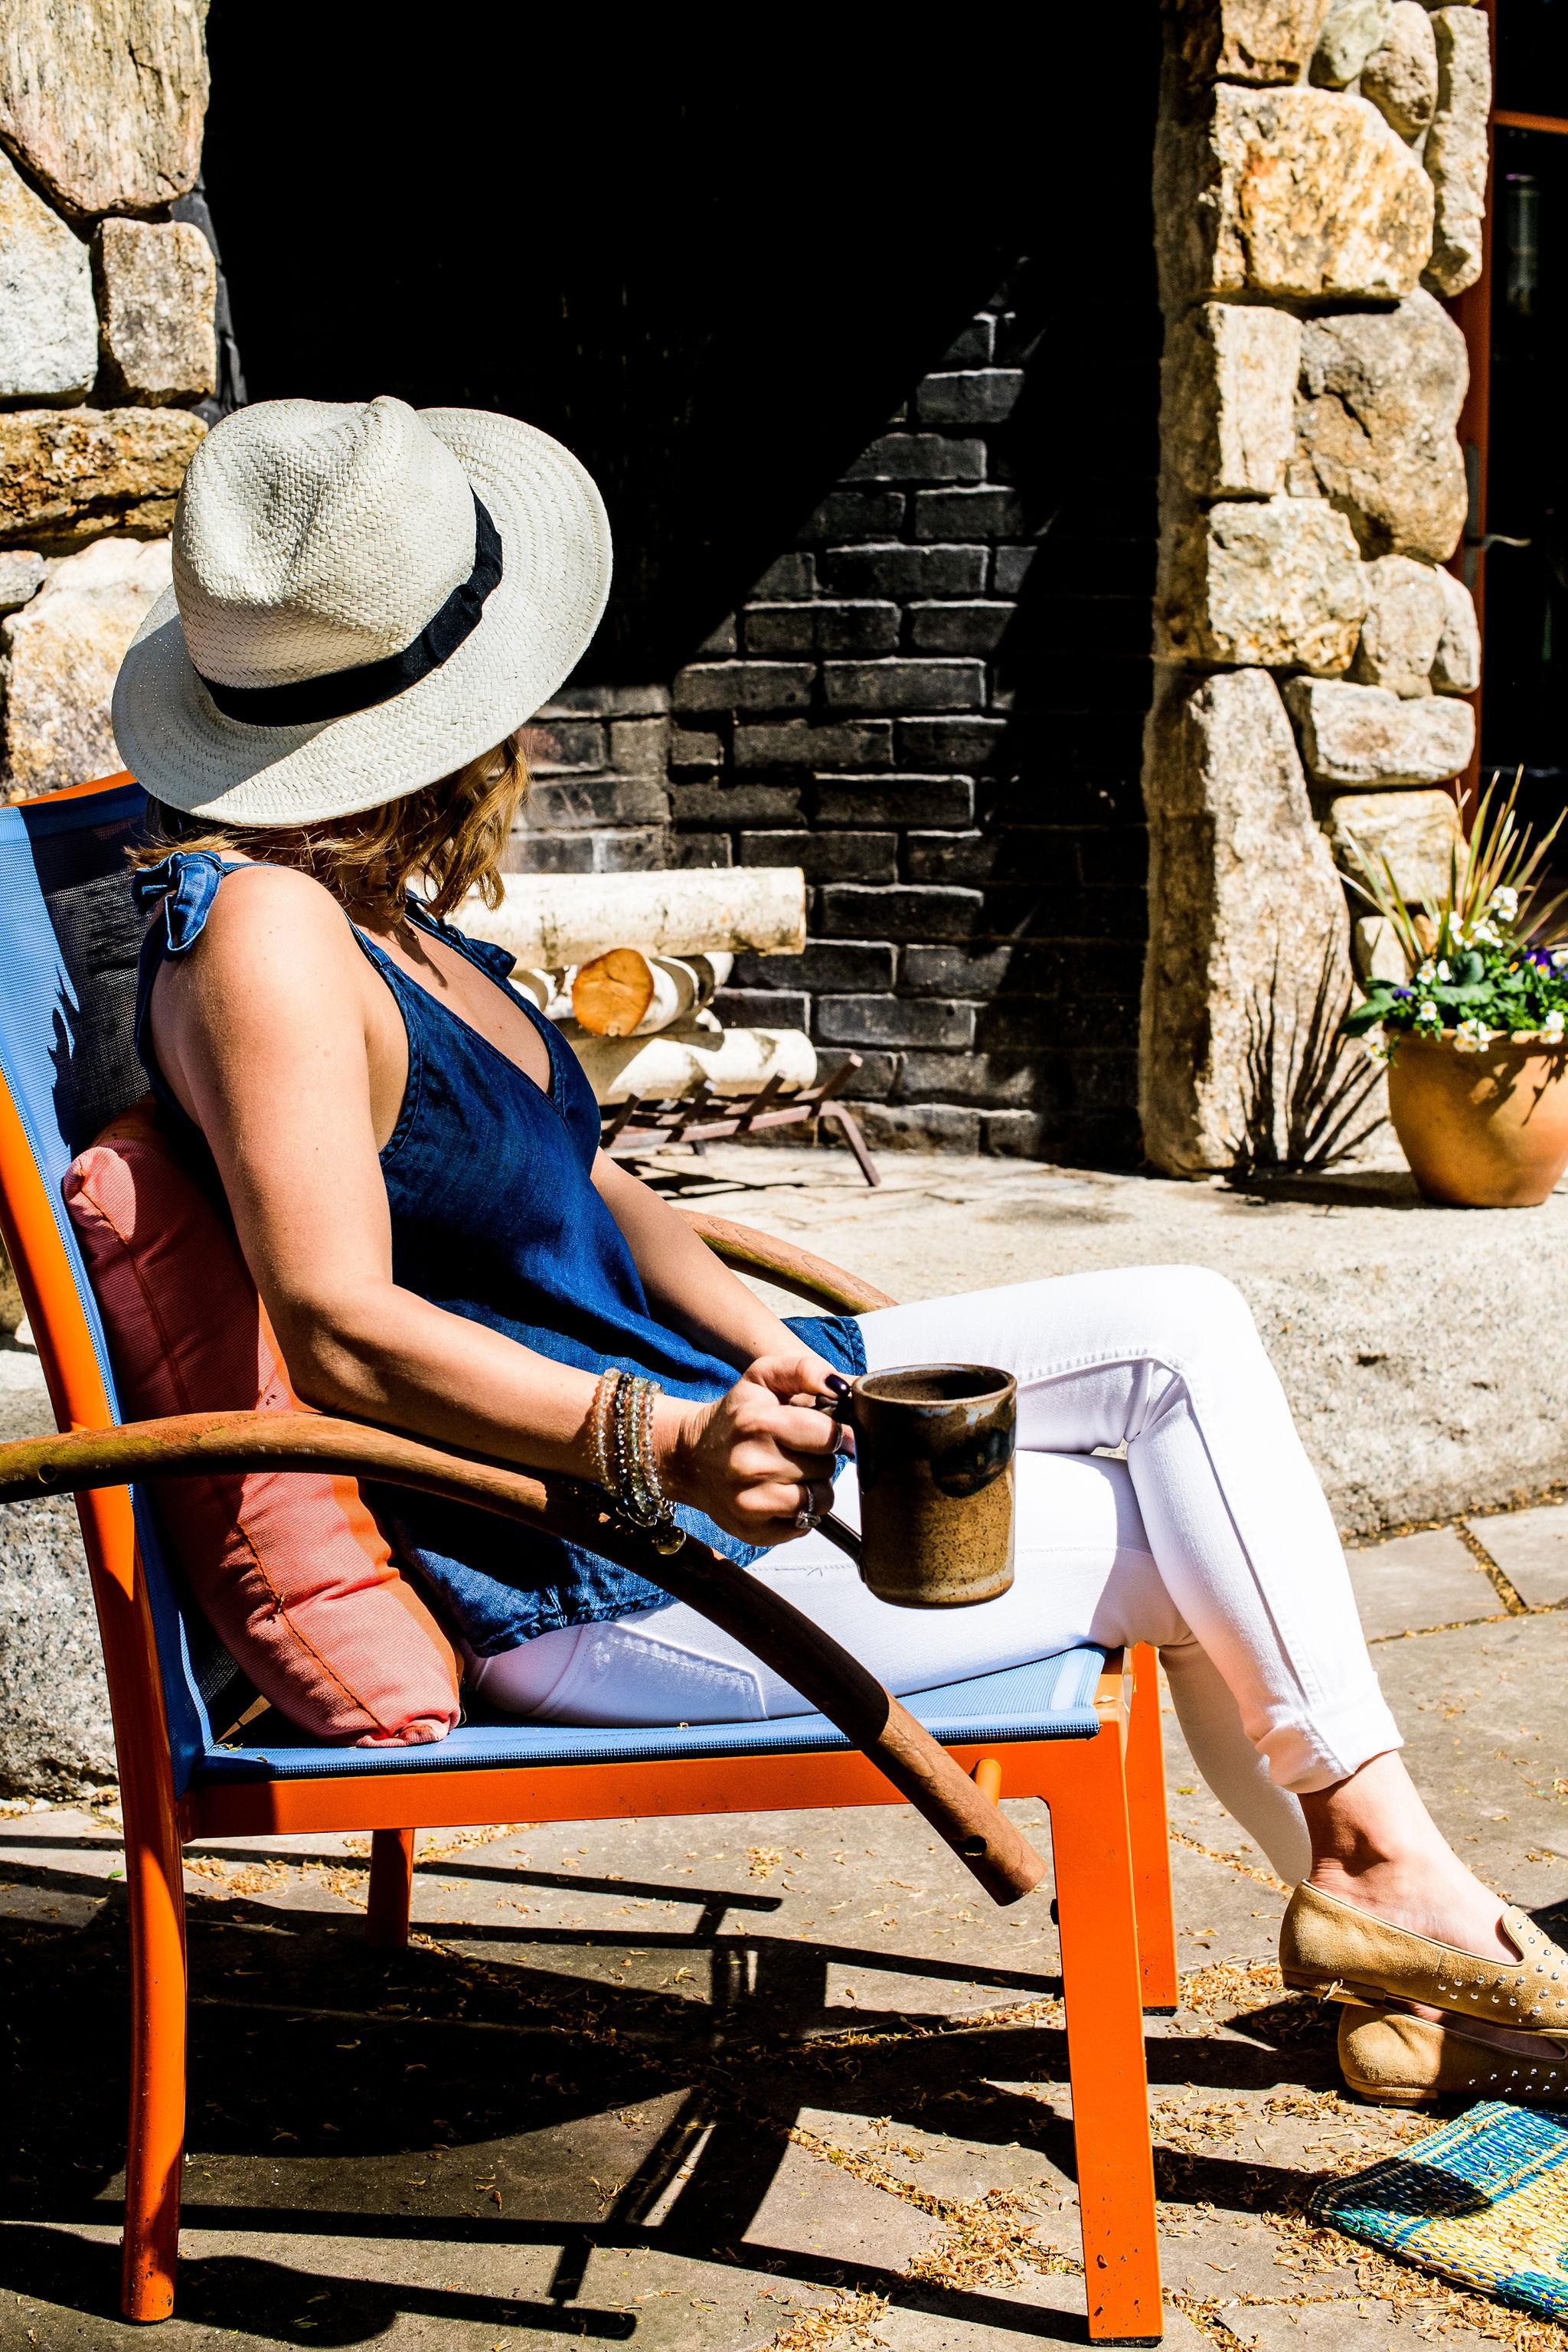 9 healthy travel tips while still having fun